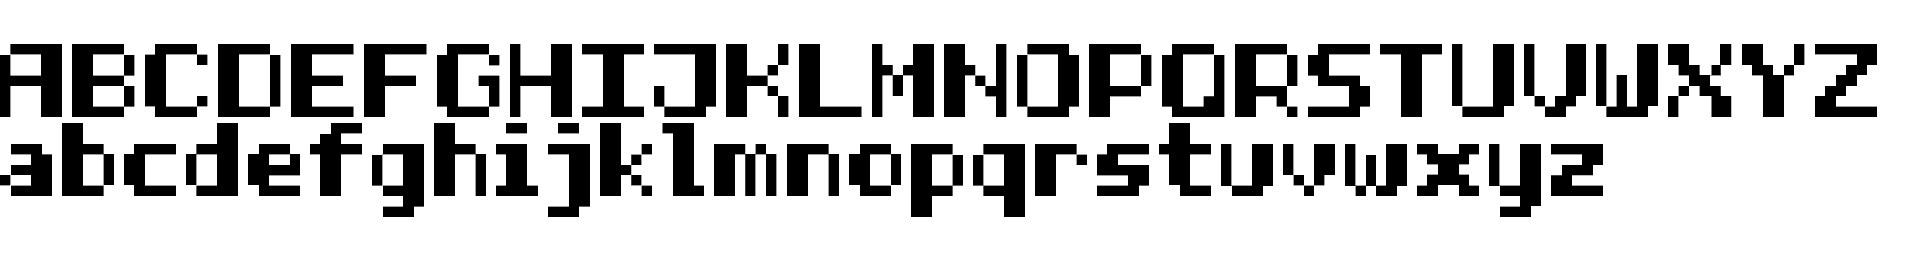 Half Bold Pixel-7